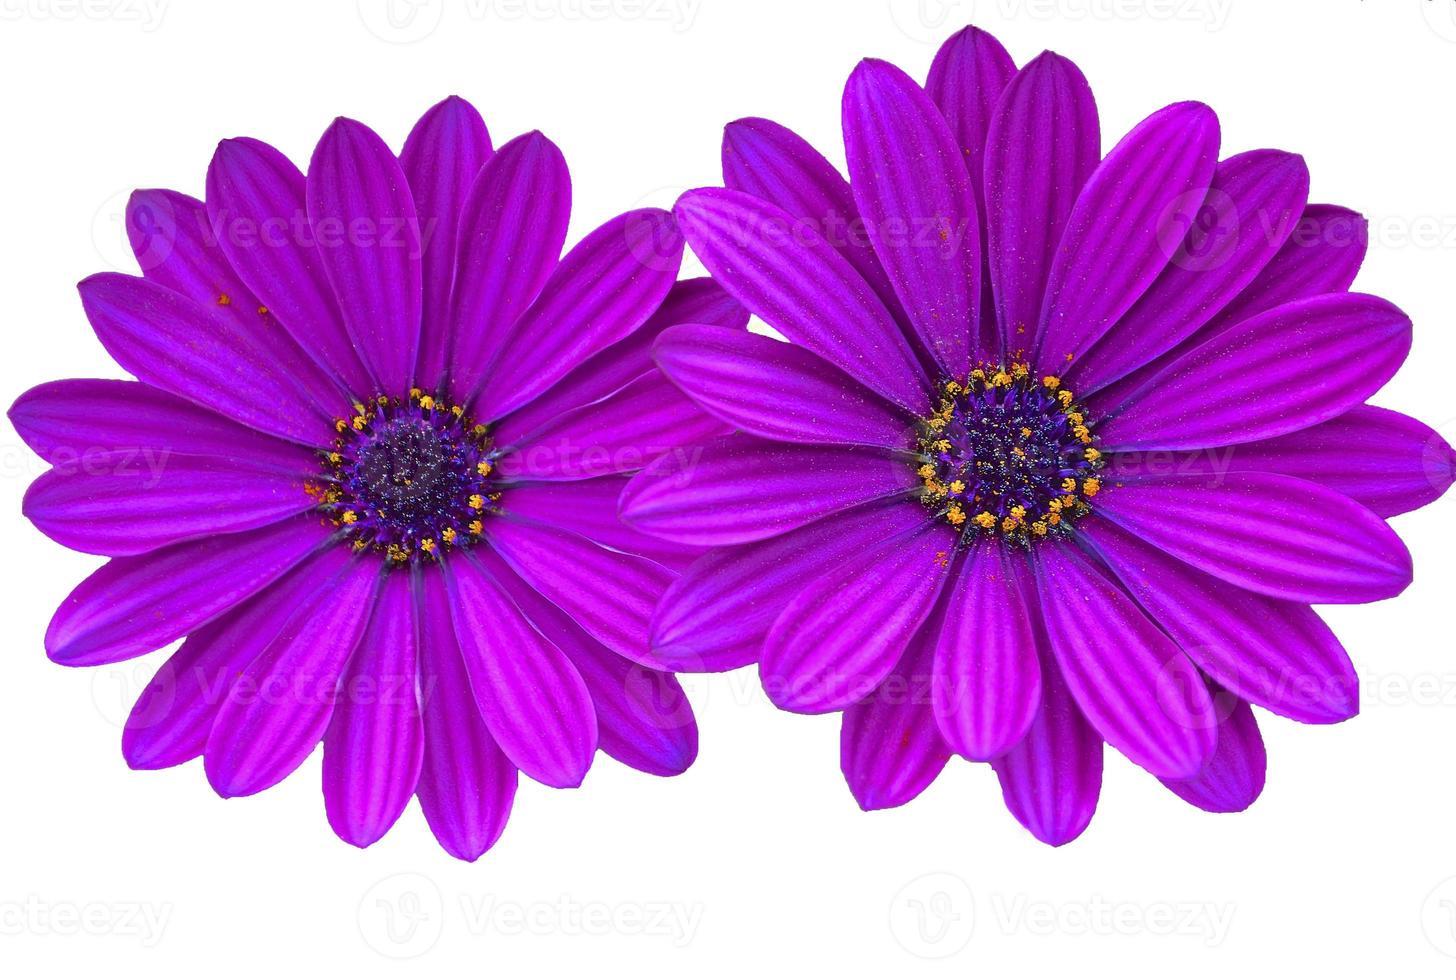 paarse madeliefjes met kopie ruimte foto